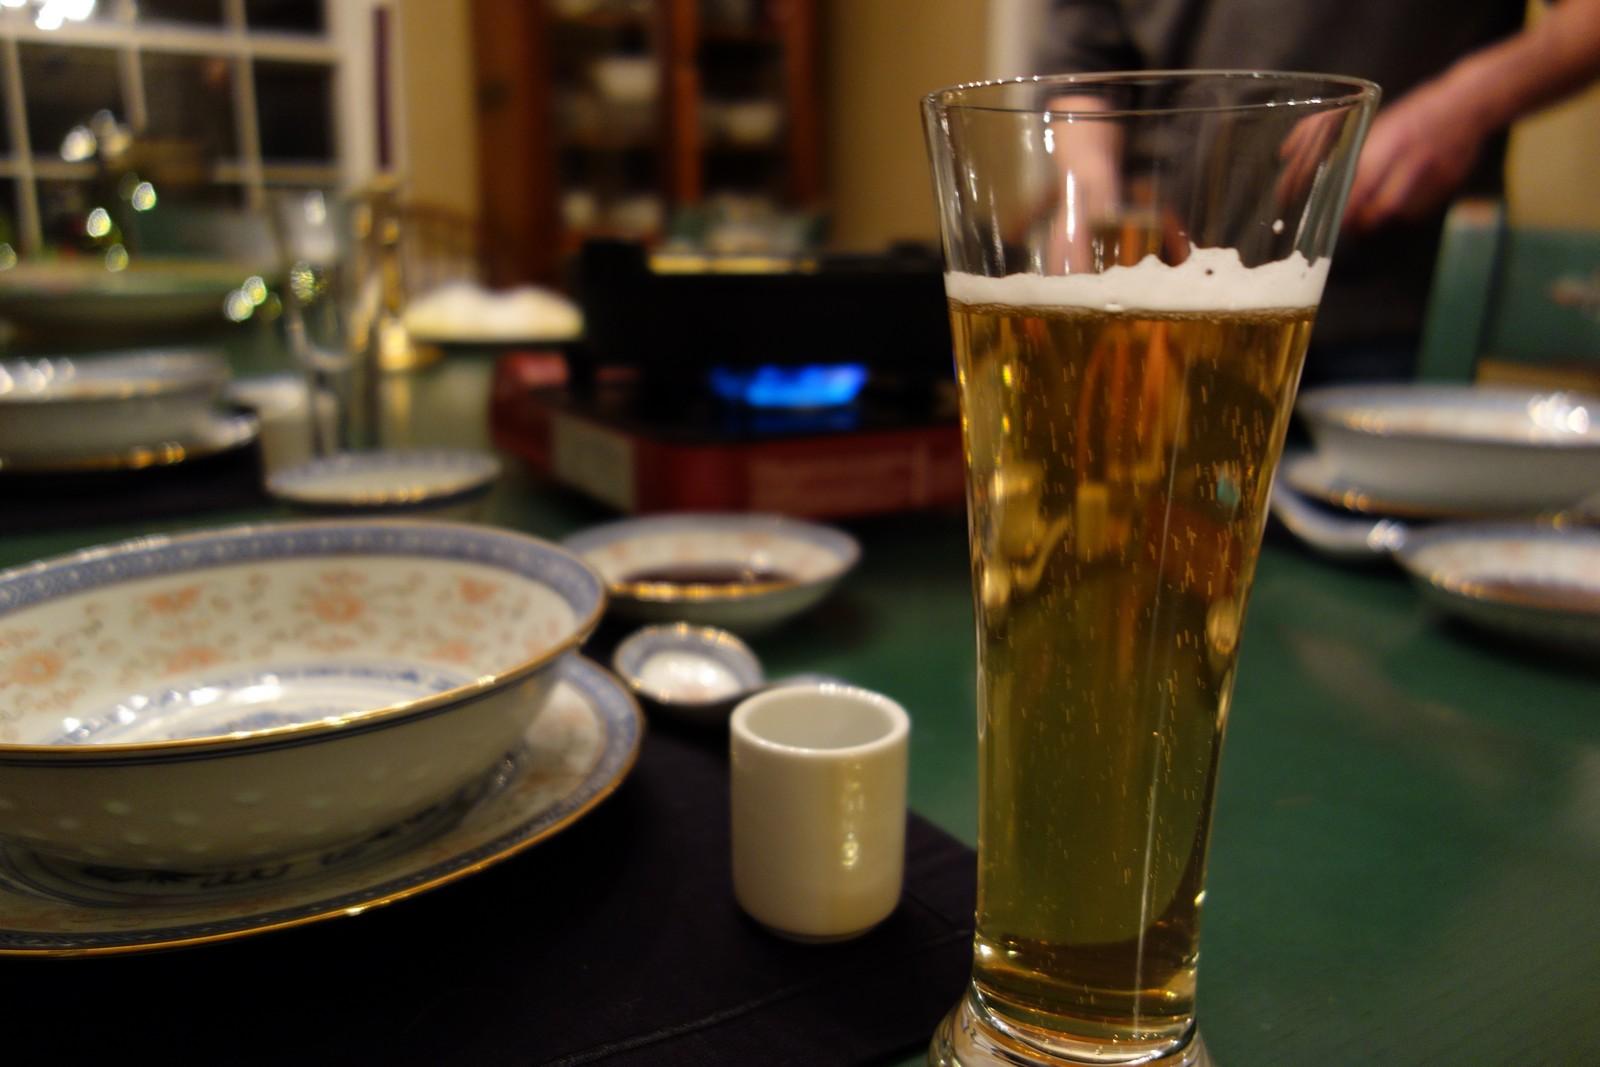 A good Japanese beer goes well with Shabu Shabu.